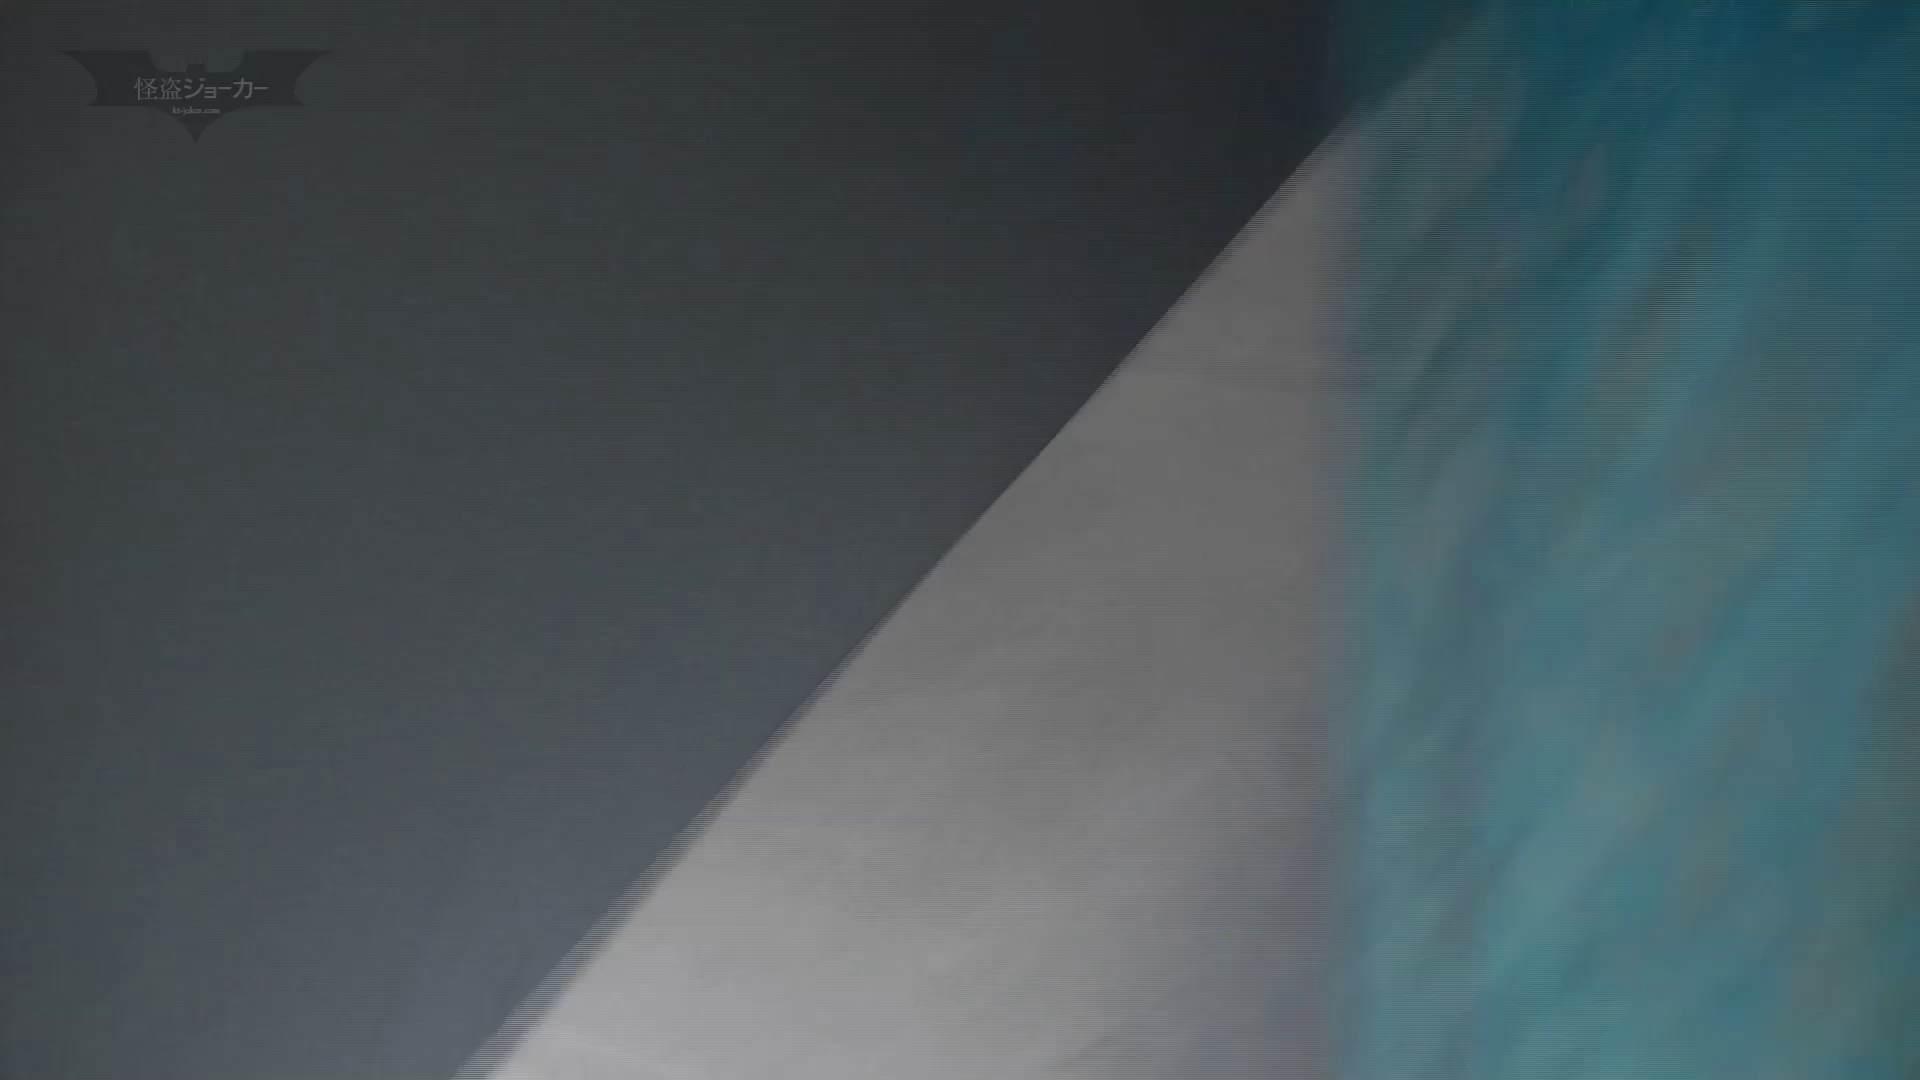 潜入!!台湾名門女学院 Vol.10 進化 高画質 すけべAV動画紹介 89枚 42